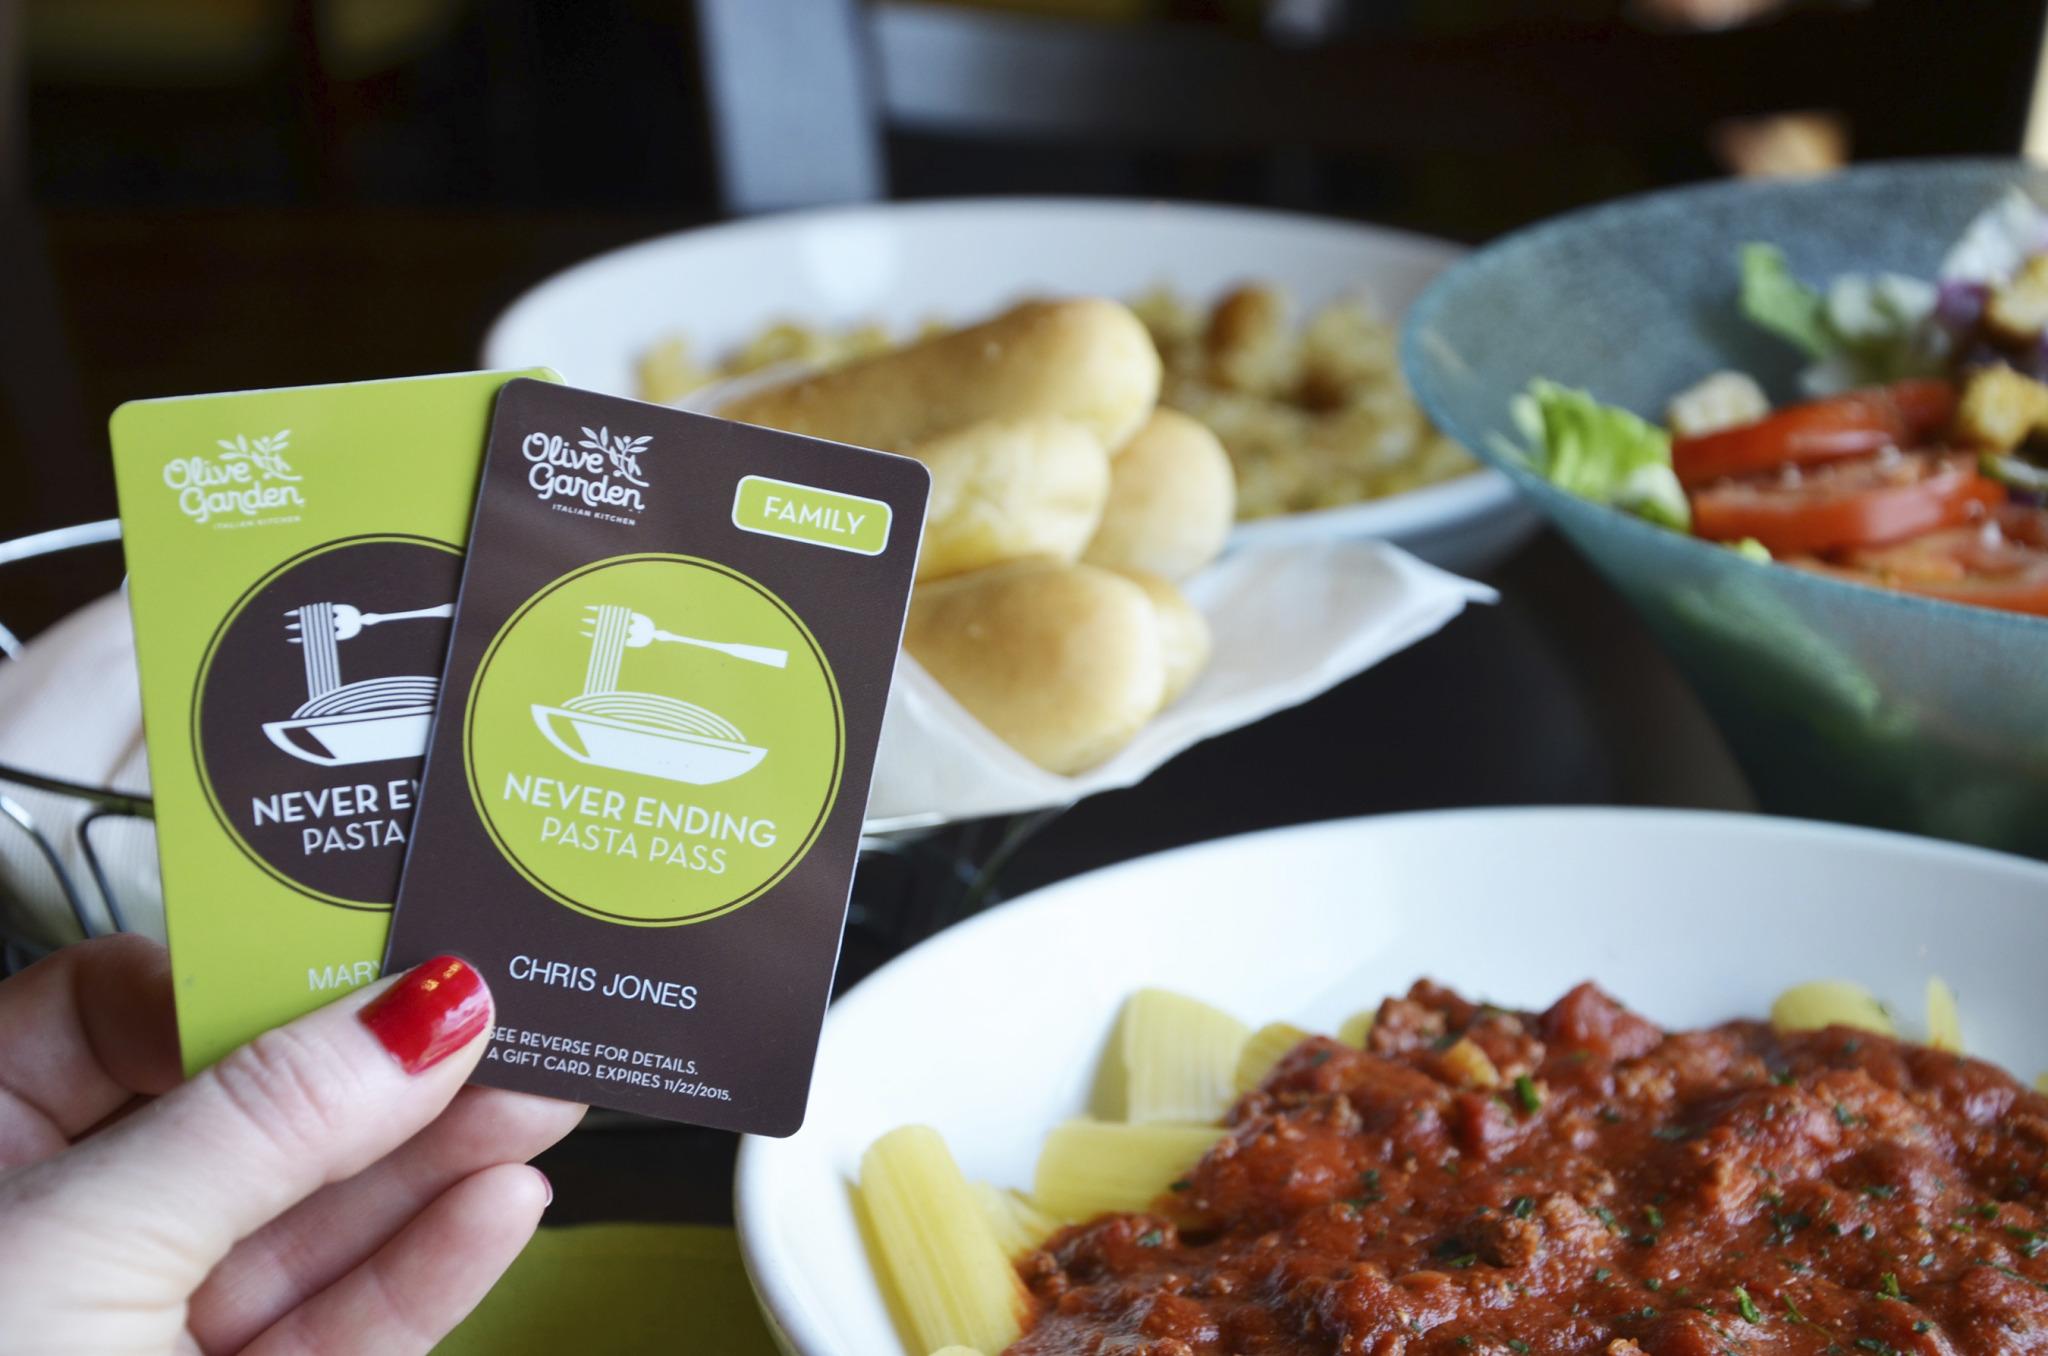 Olive garden to offer never ending pasta pass again houston chronicle for Olive garden houston locations